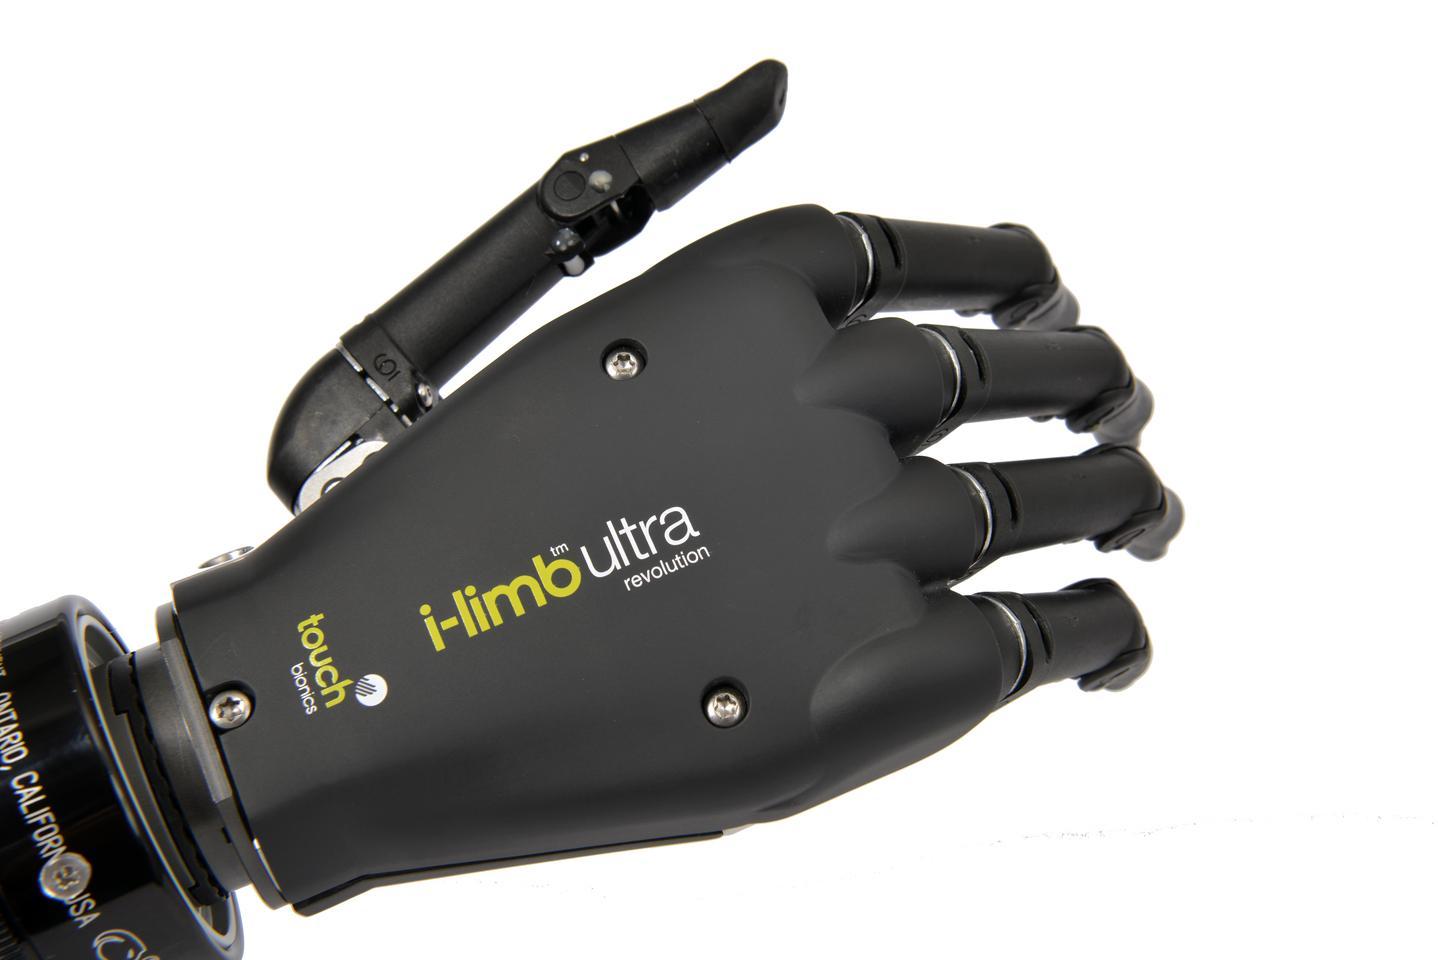 The i-limb ultra revolution prosthetic hand